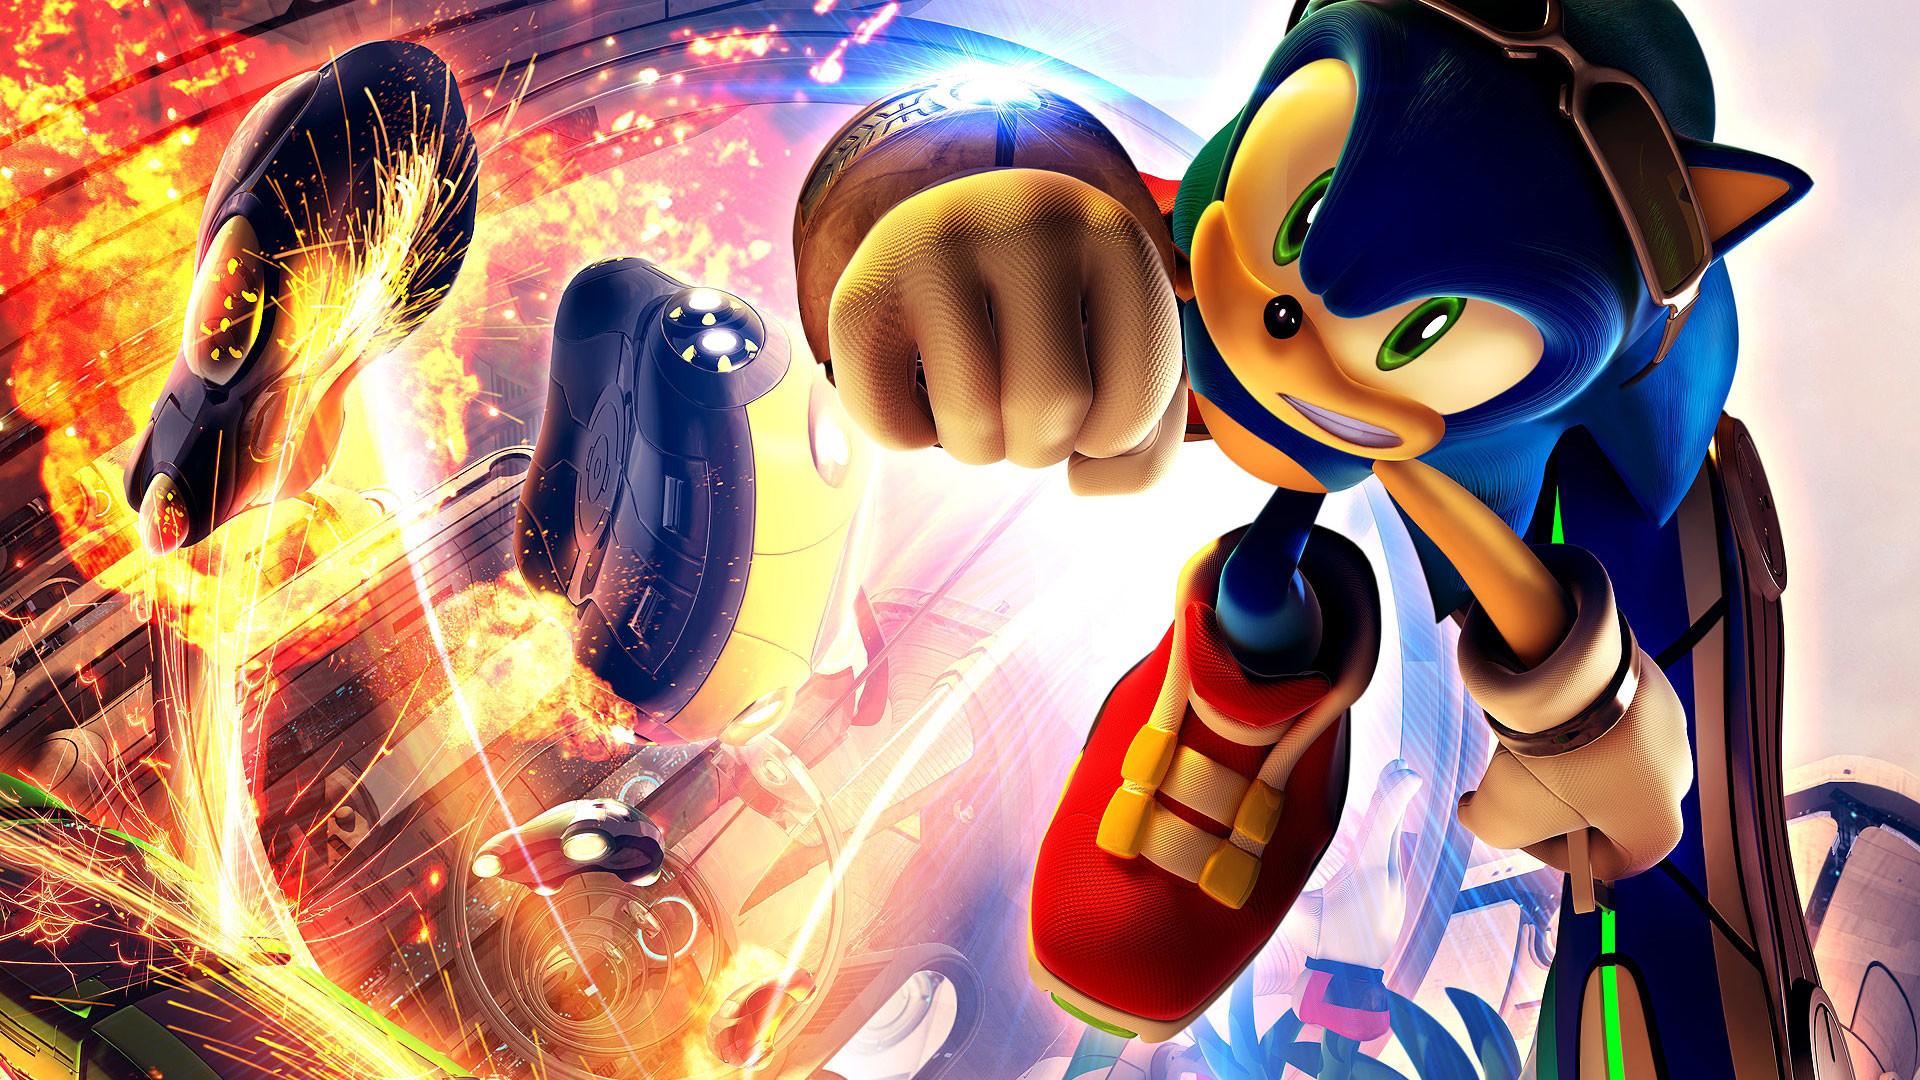 HD Sonic Wallpaper 1080p